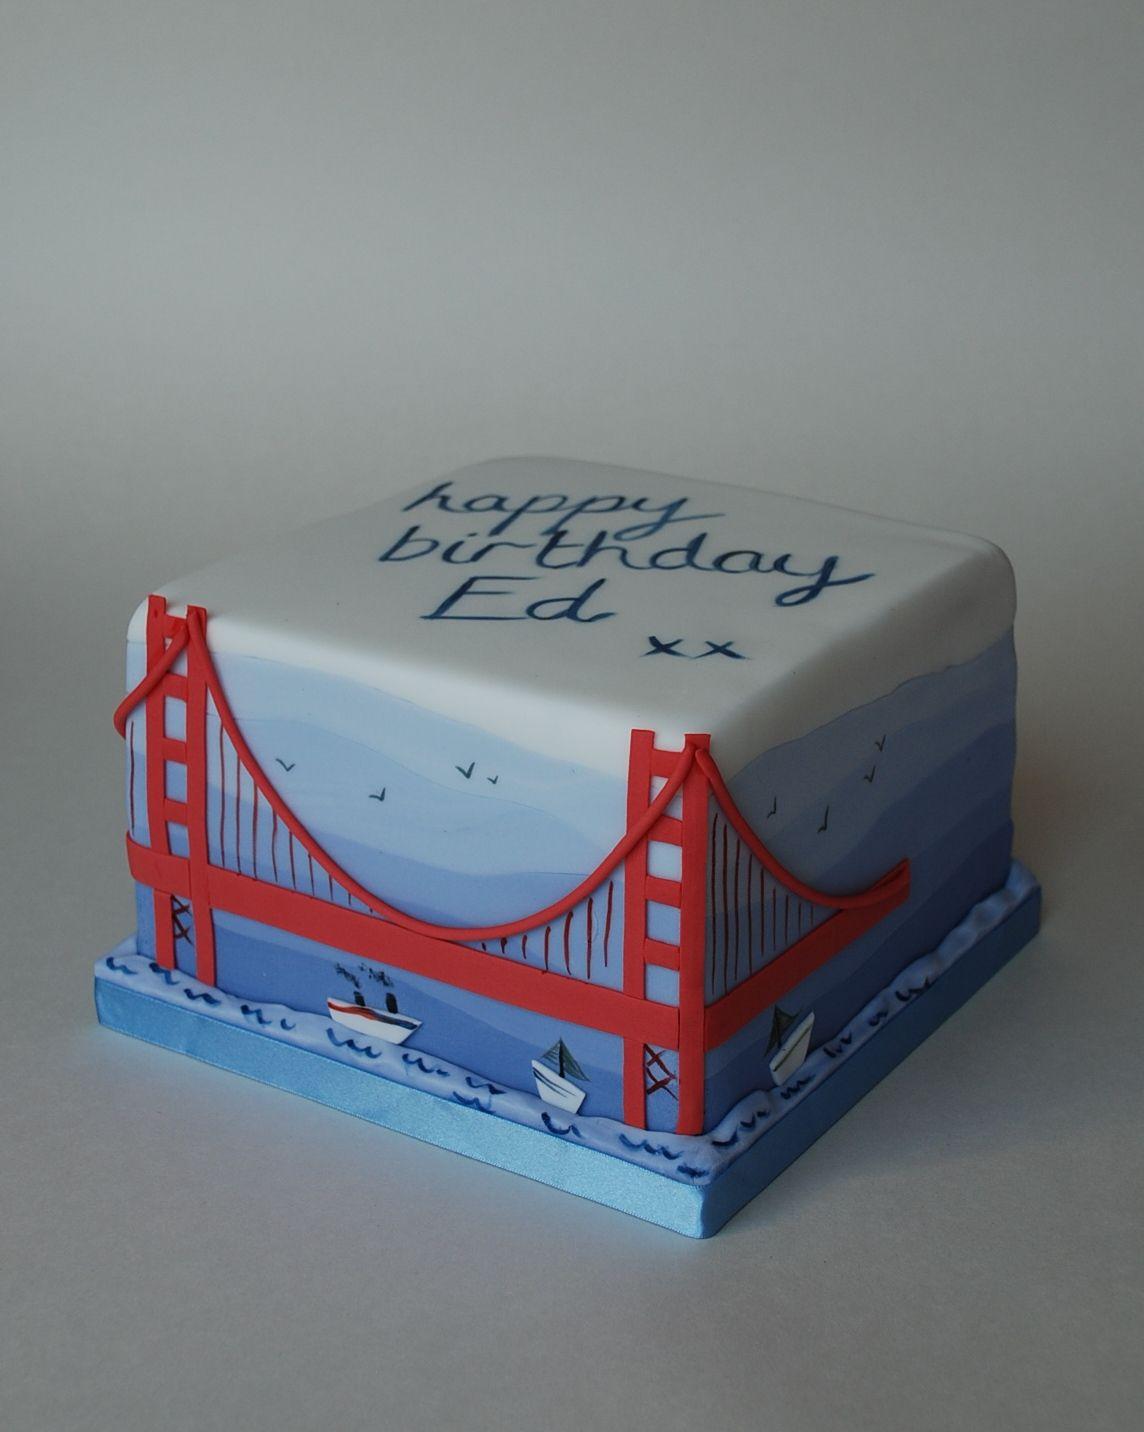 Golden gate bridge cake fondant cake designs city cake